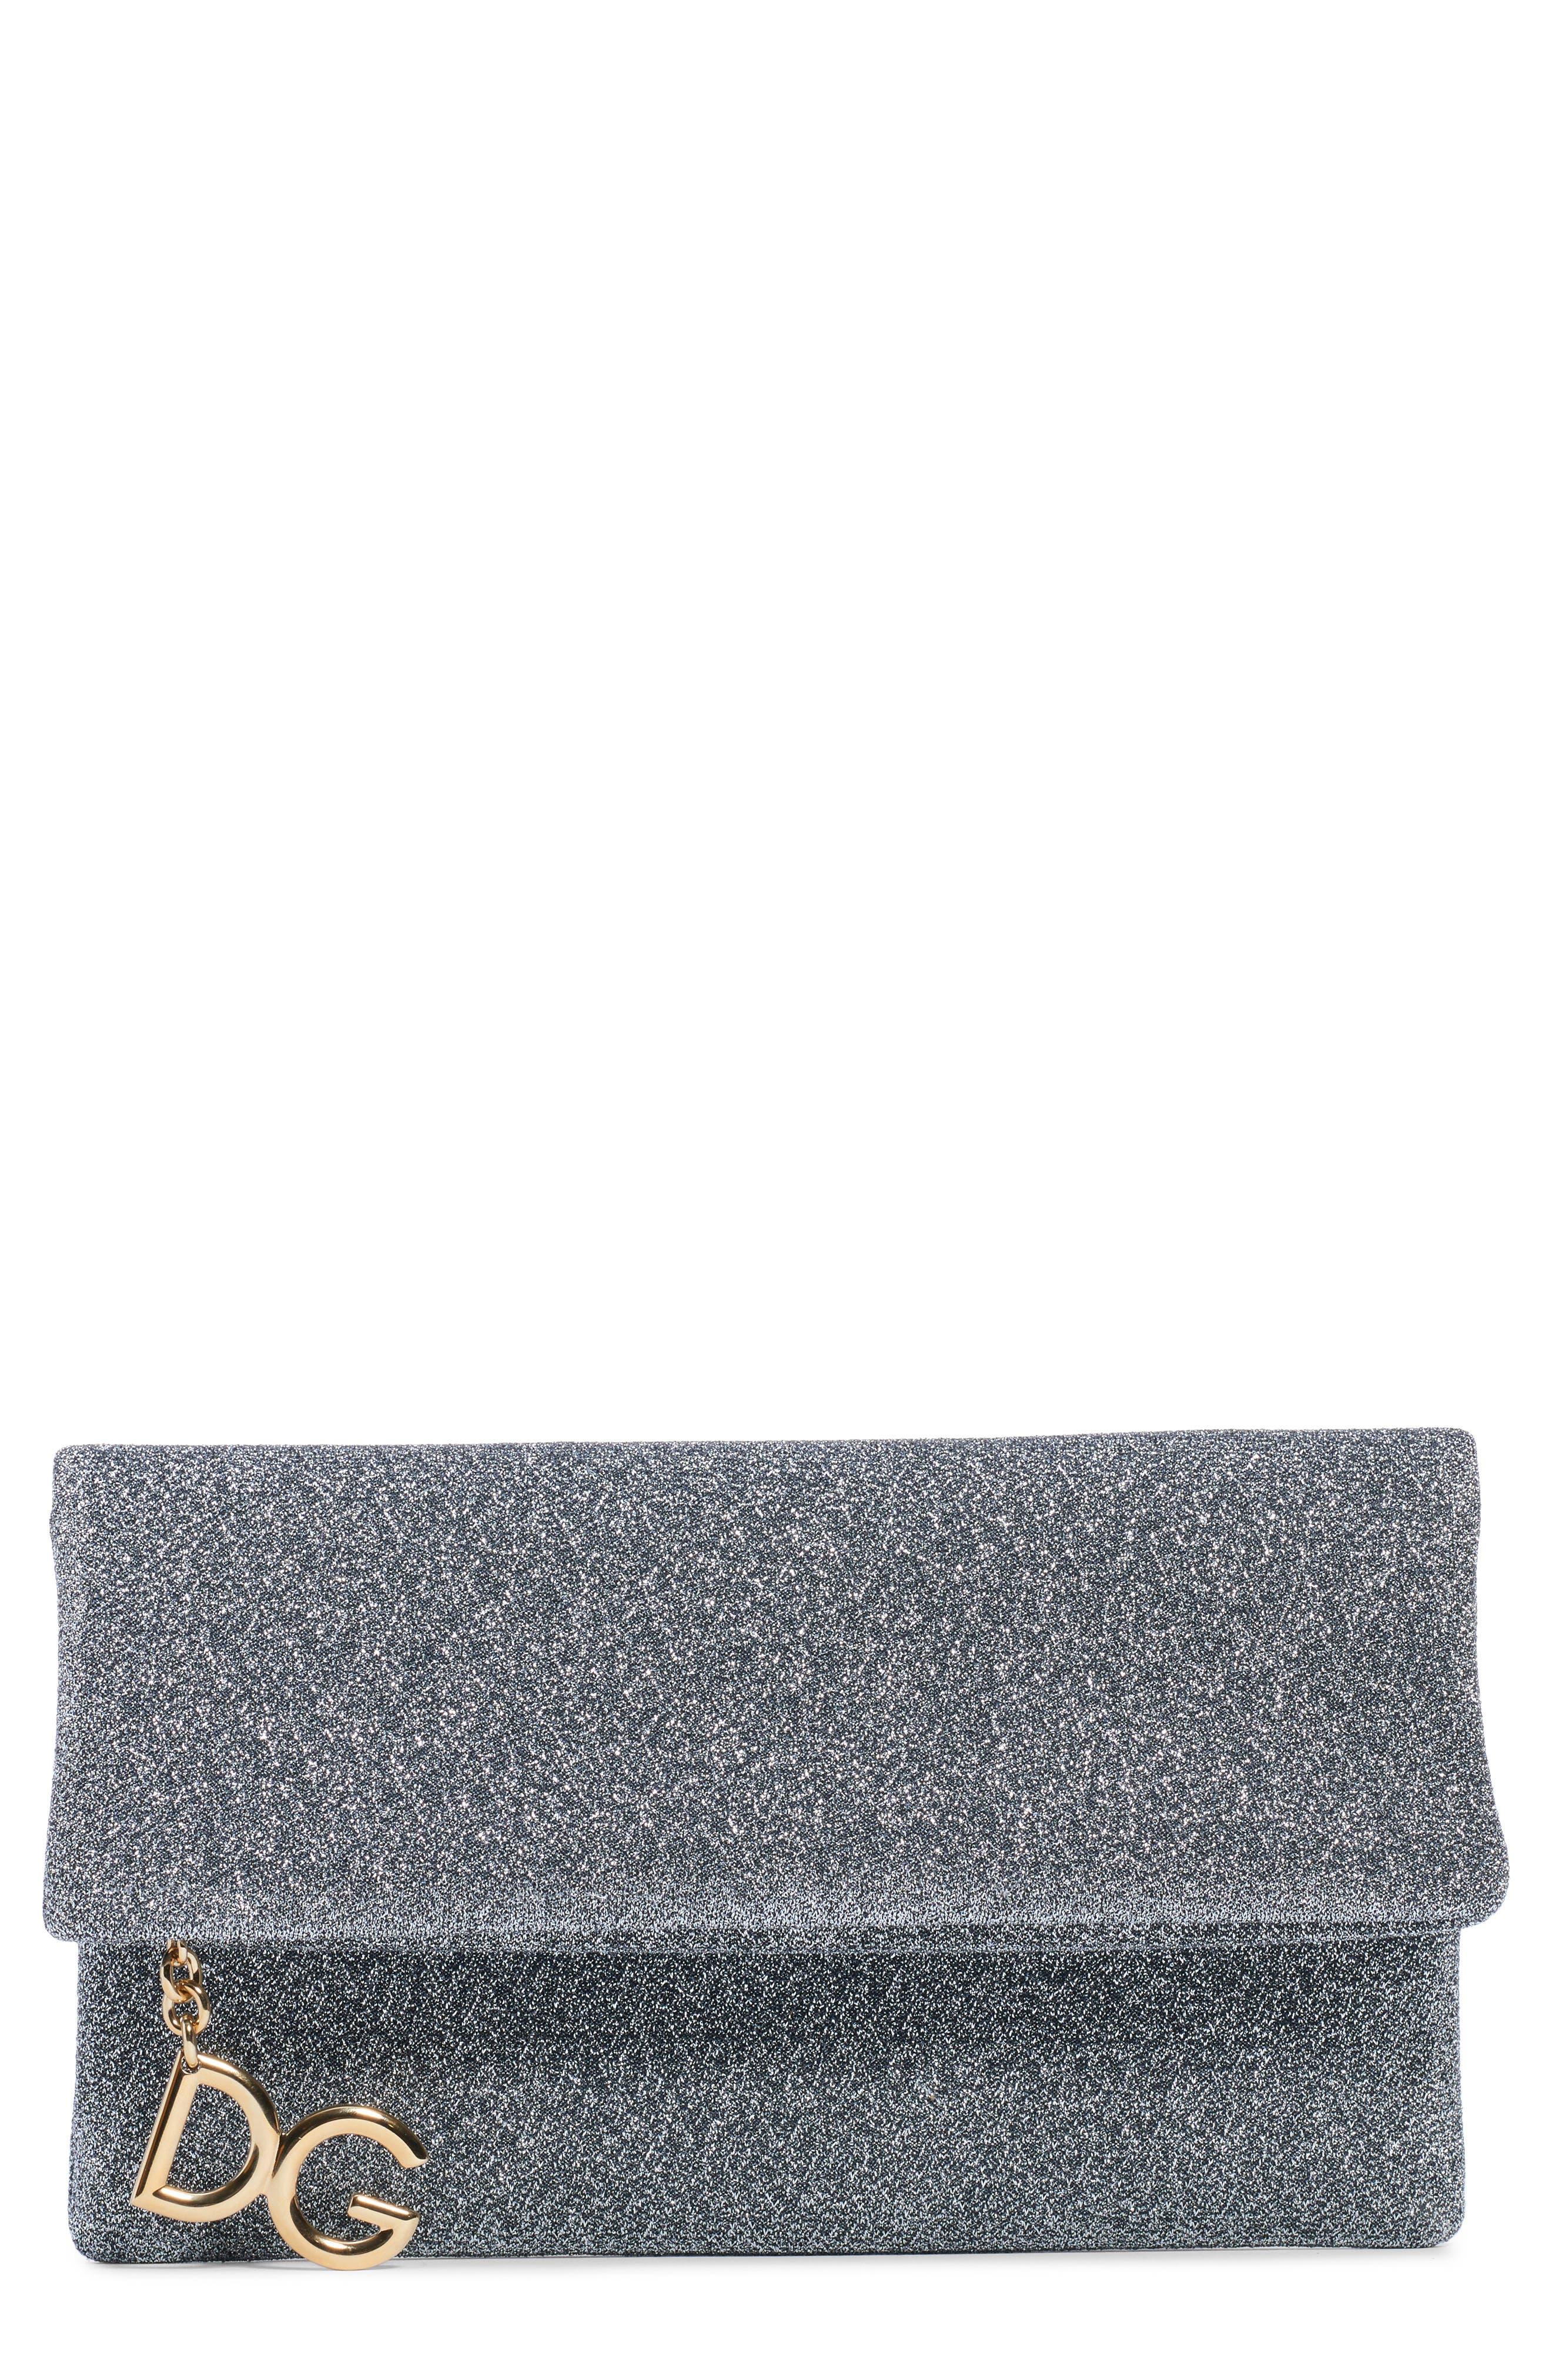 Dolce   Gabbana Handbags   Purses  f0ef42ce92c1e